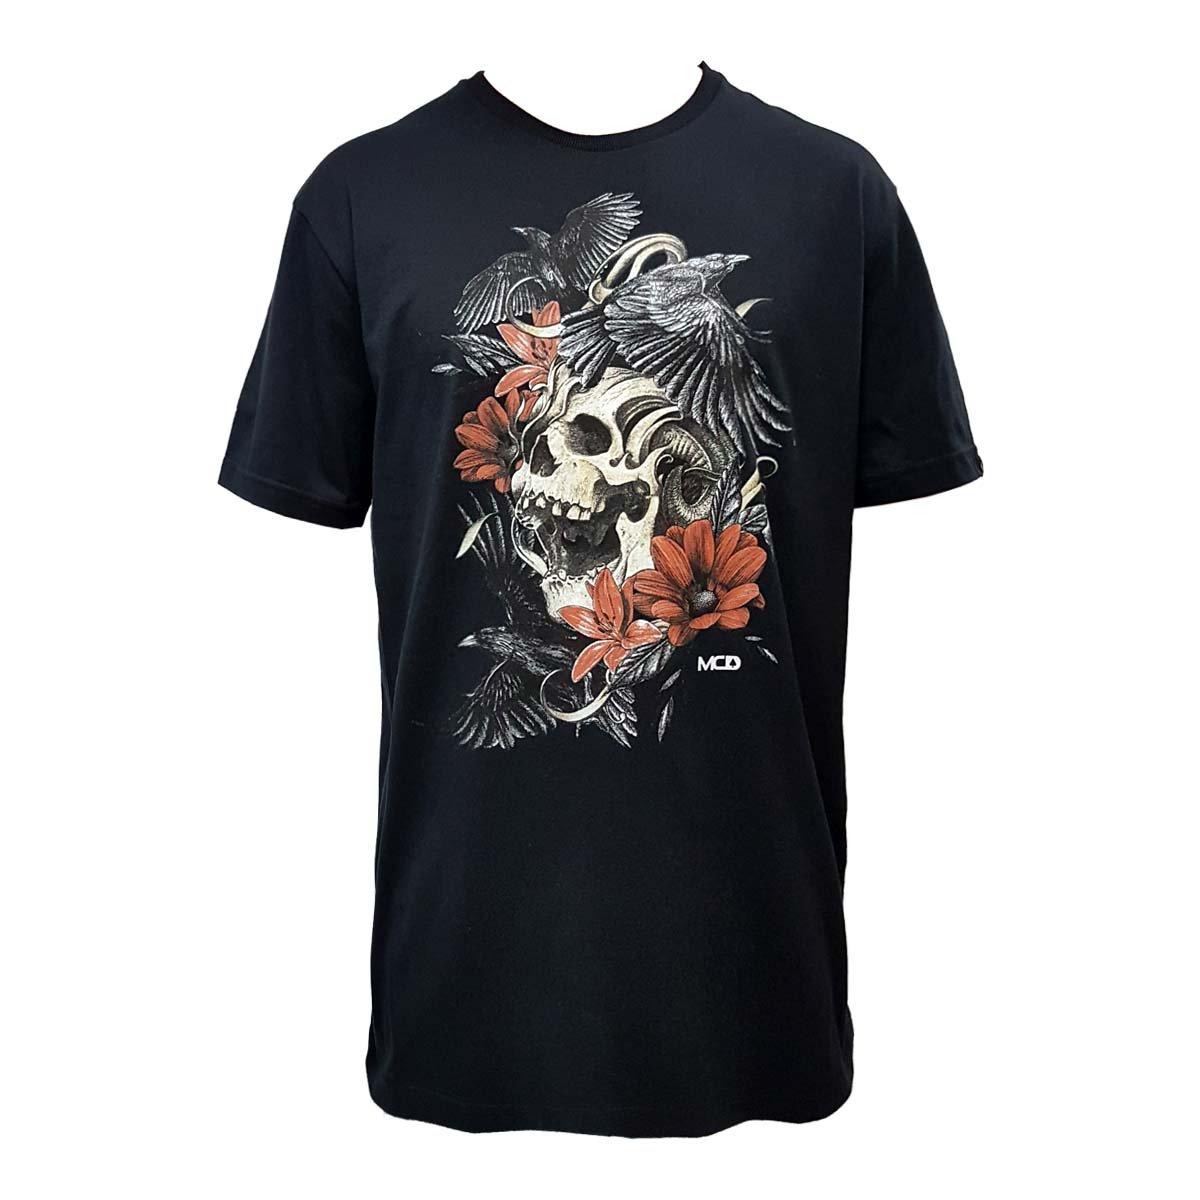 c61fd133eca5c Camiseta MCD Screen Skull Preta - Compre Agora